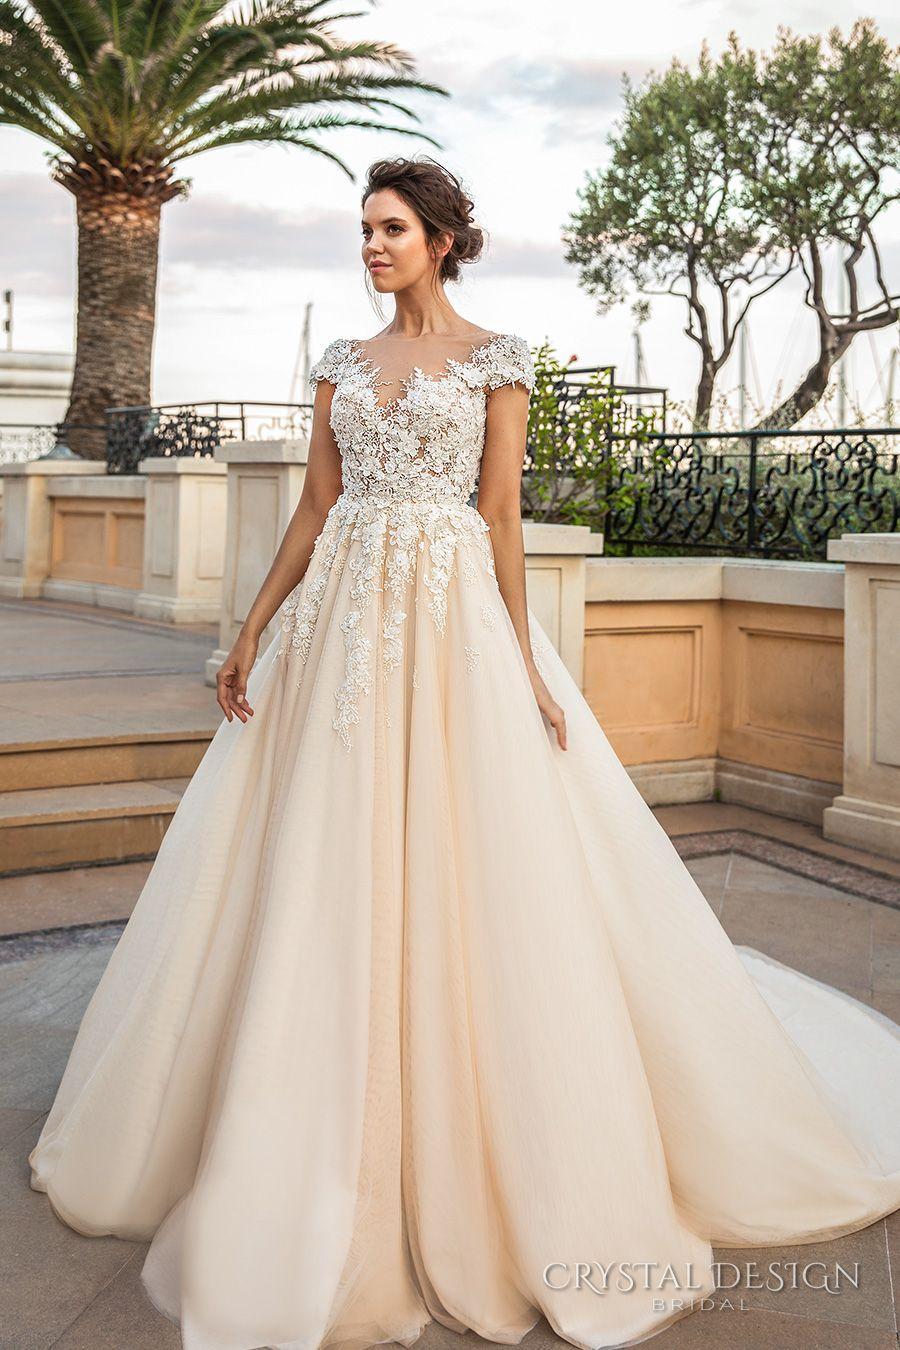 Crystal Design 8 Wedding Dresses — Haute Couture Bridal